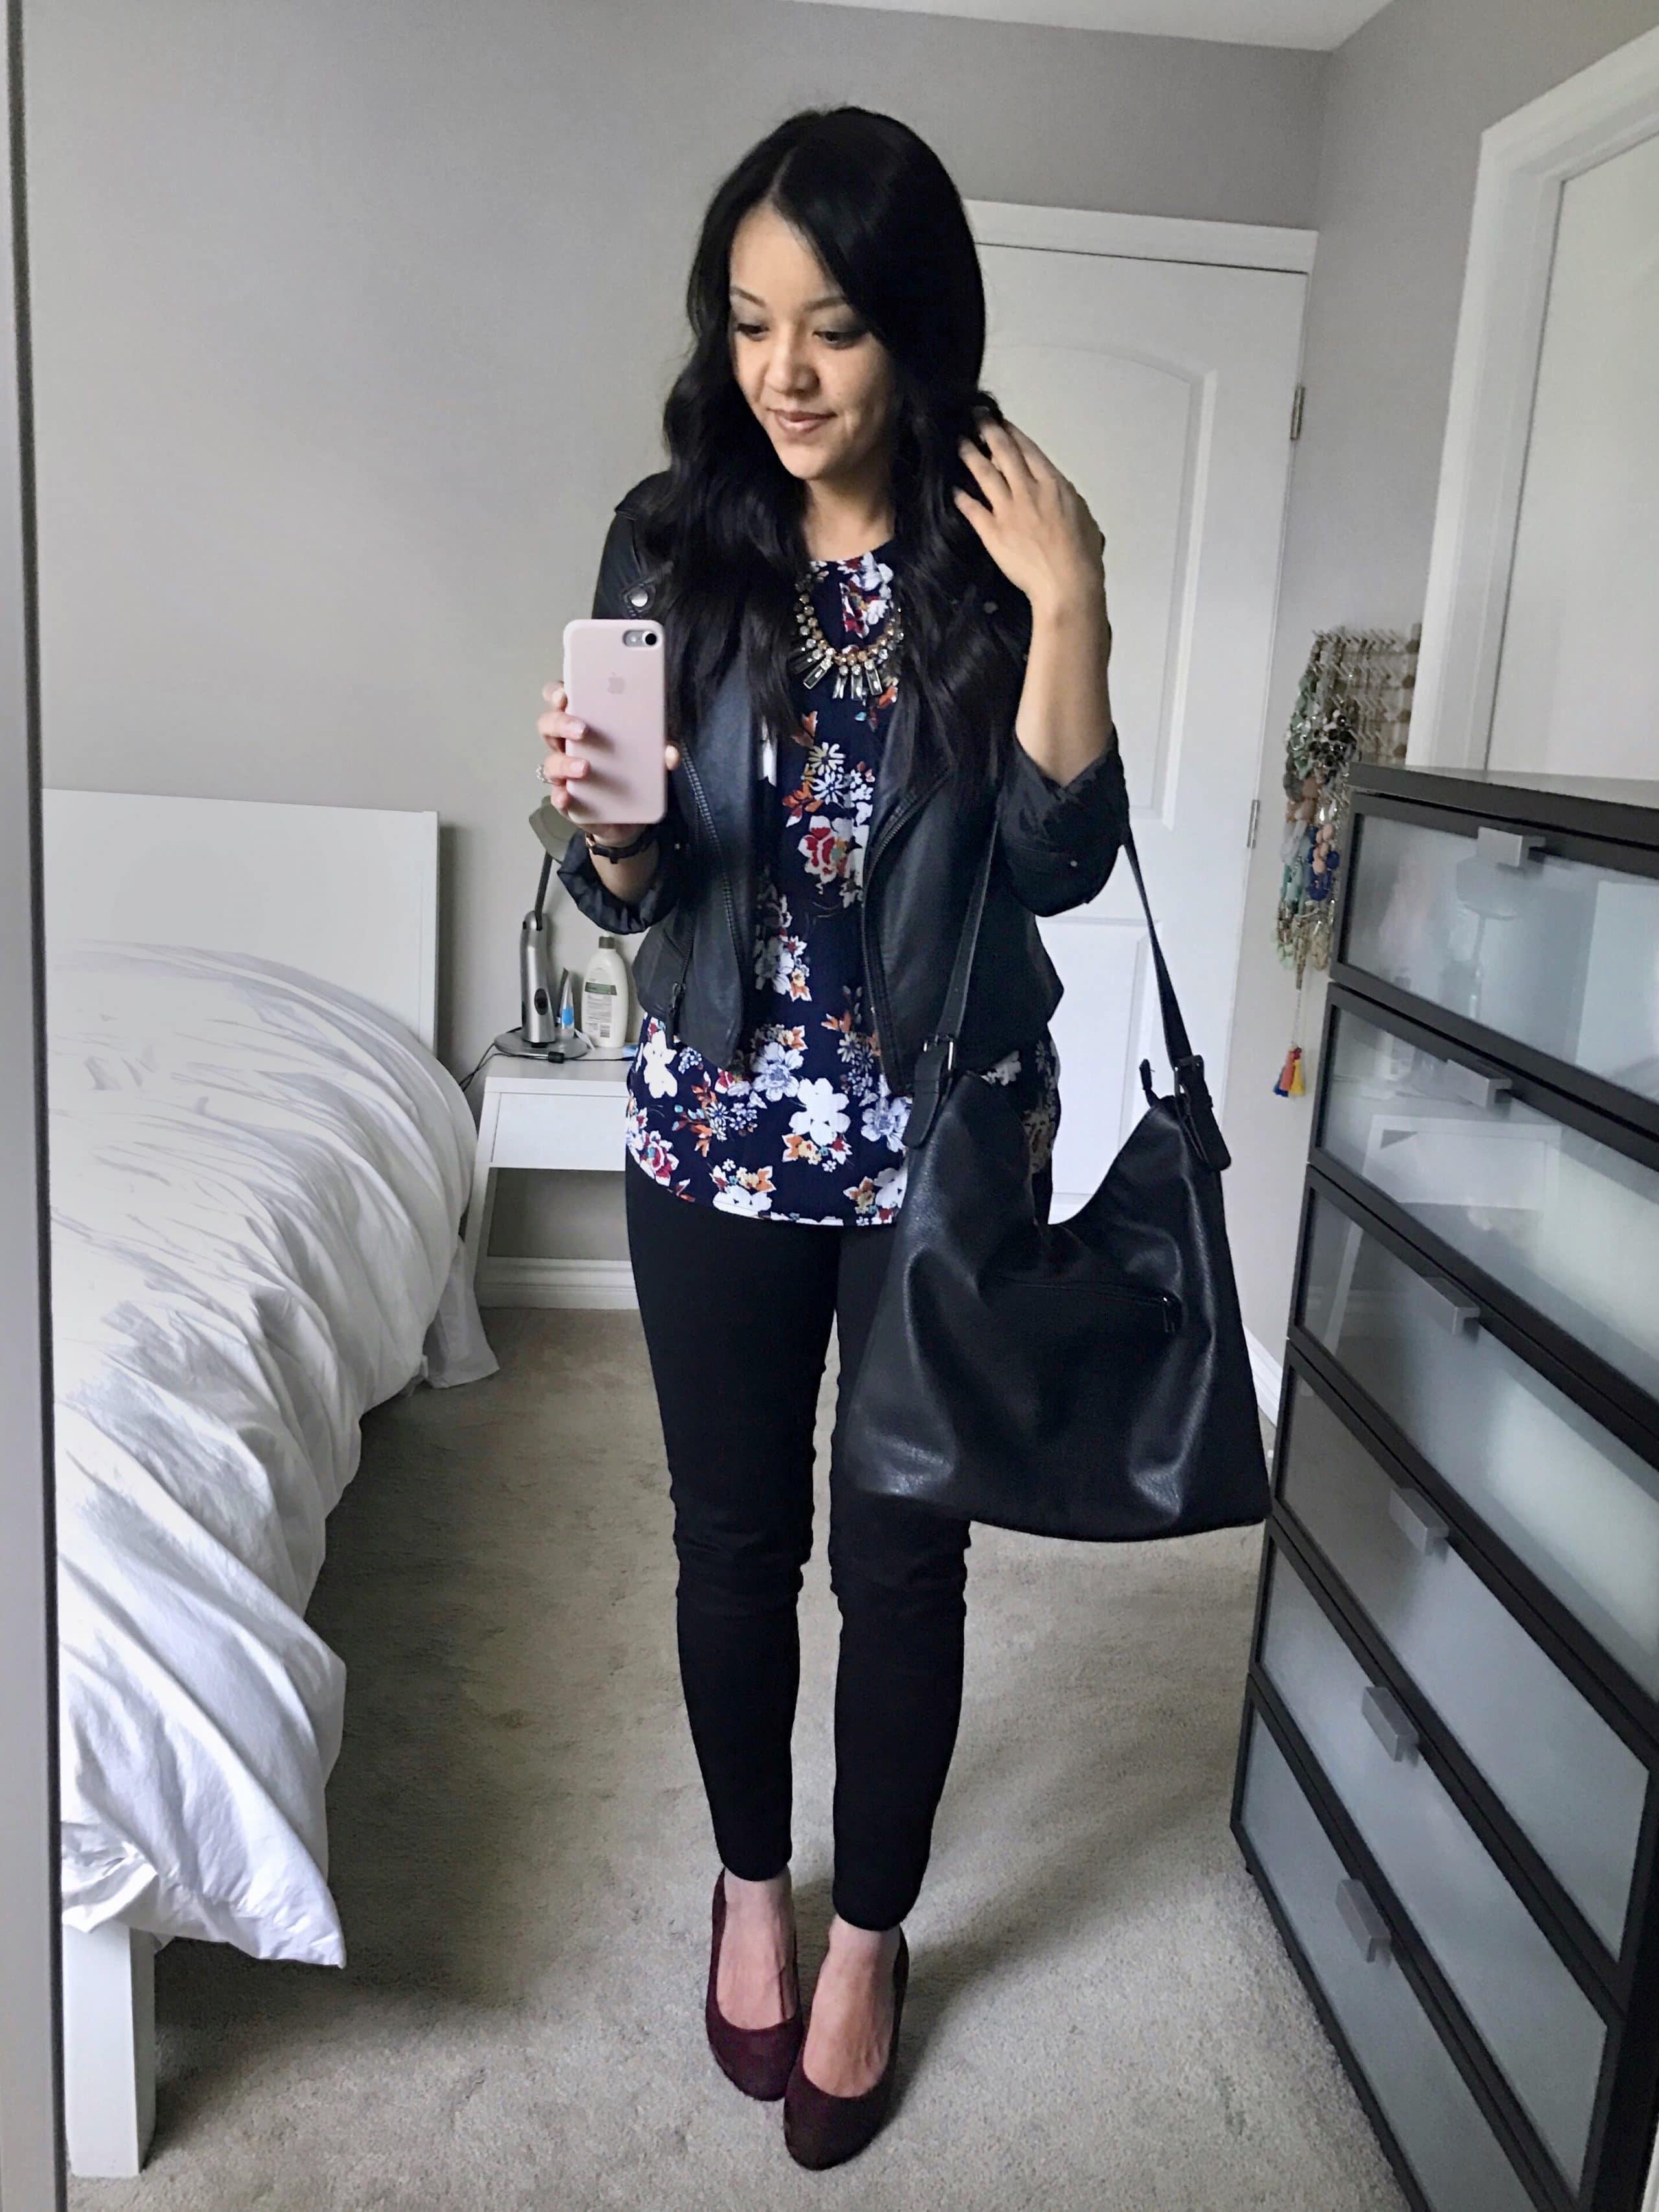 Navy Floral Print Top + Black Jeans + Maroon Pumps + Black Faux Leather Jacket